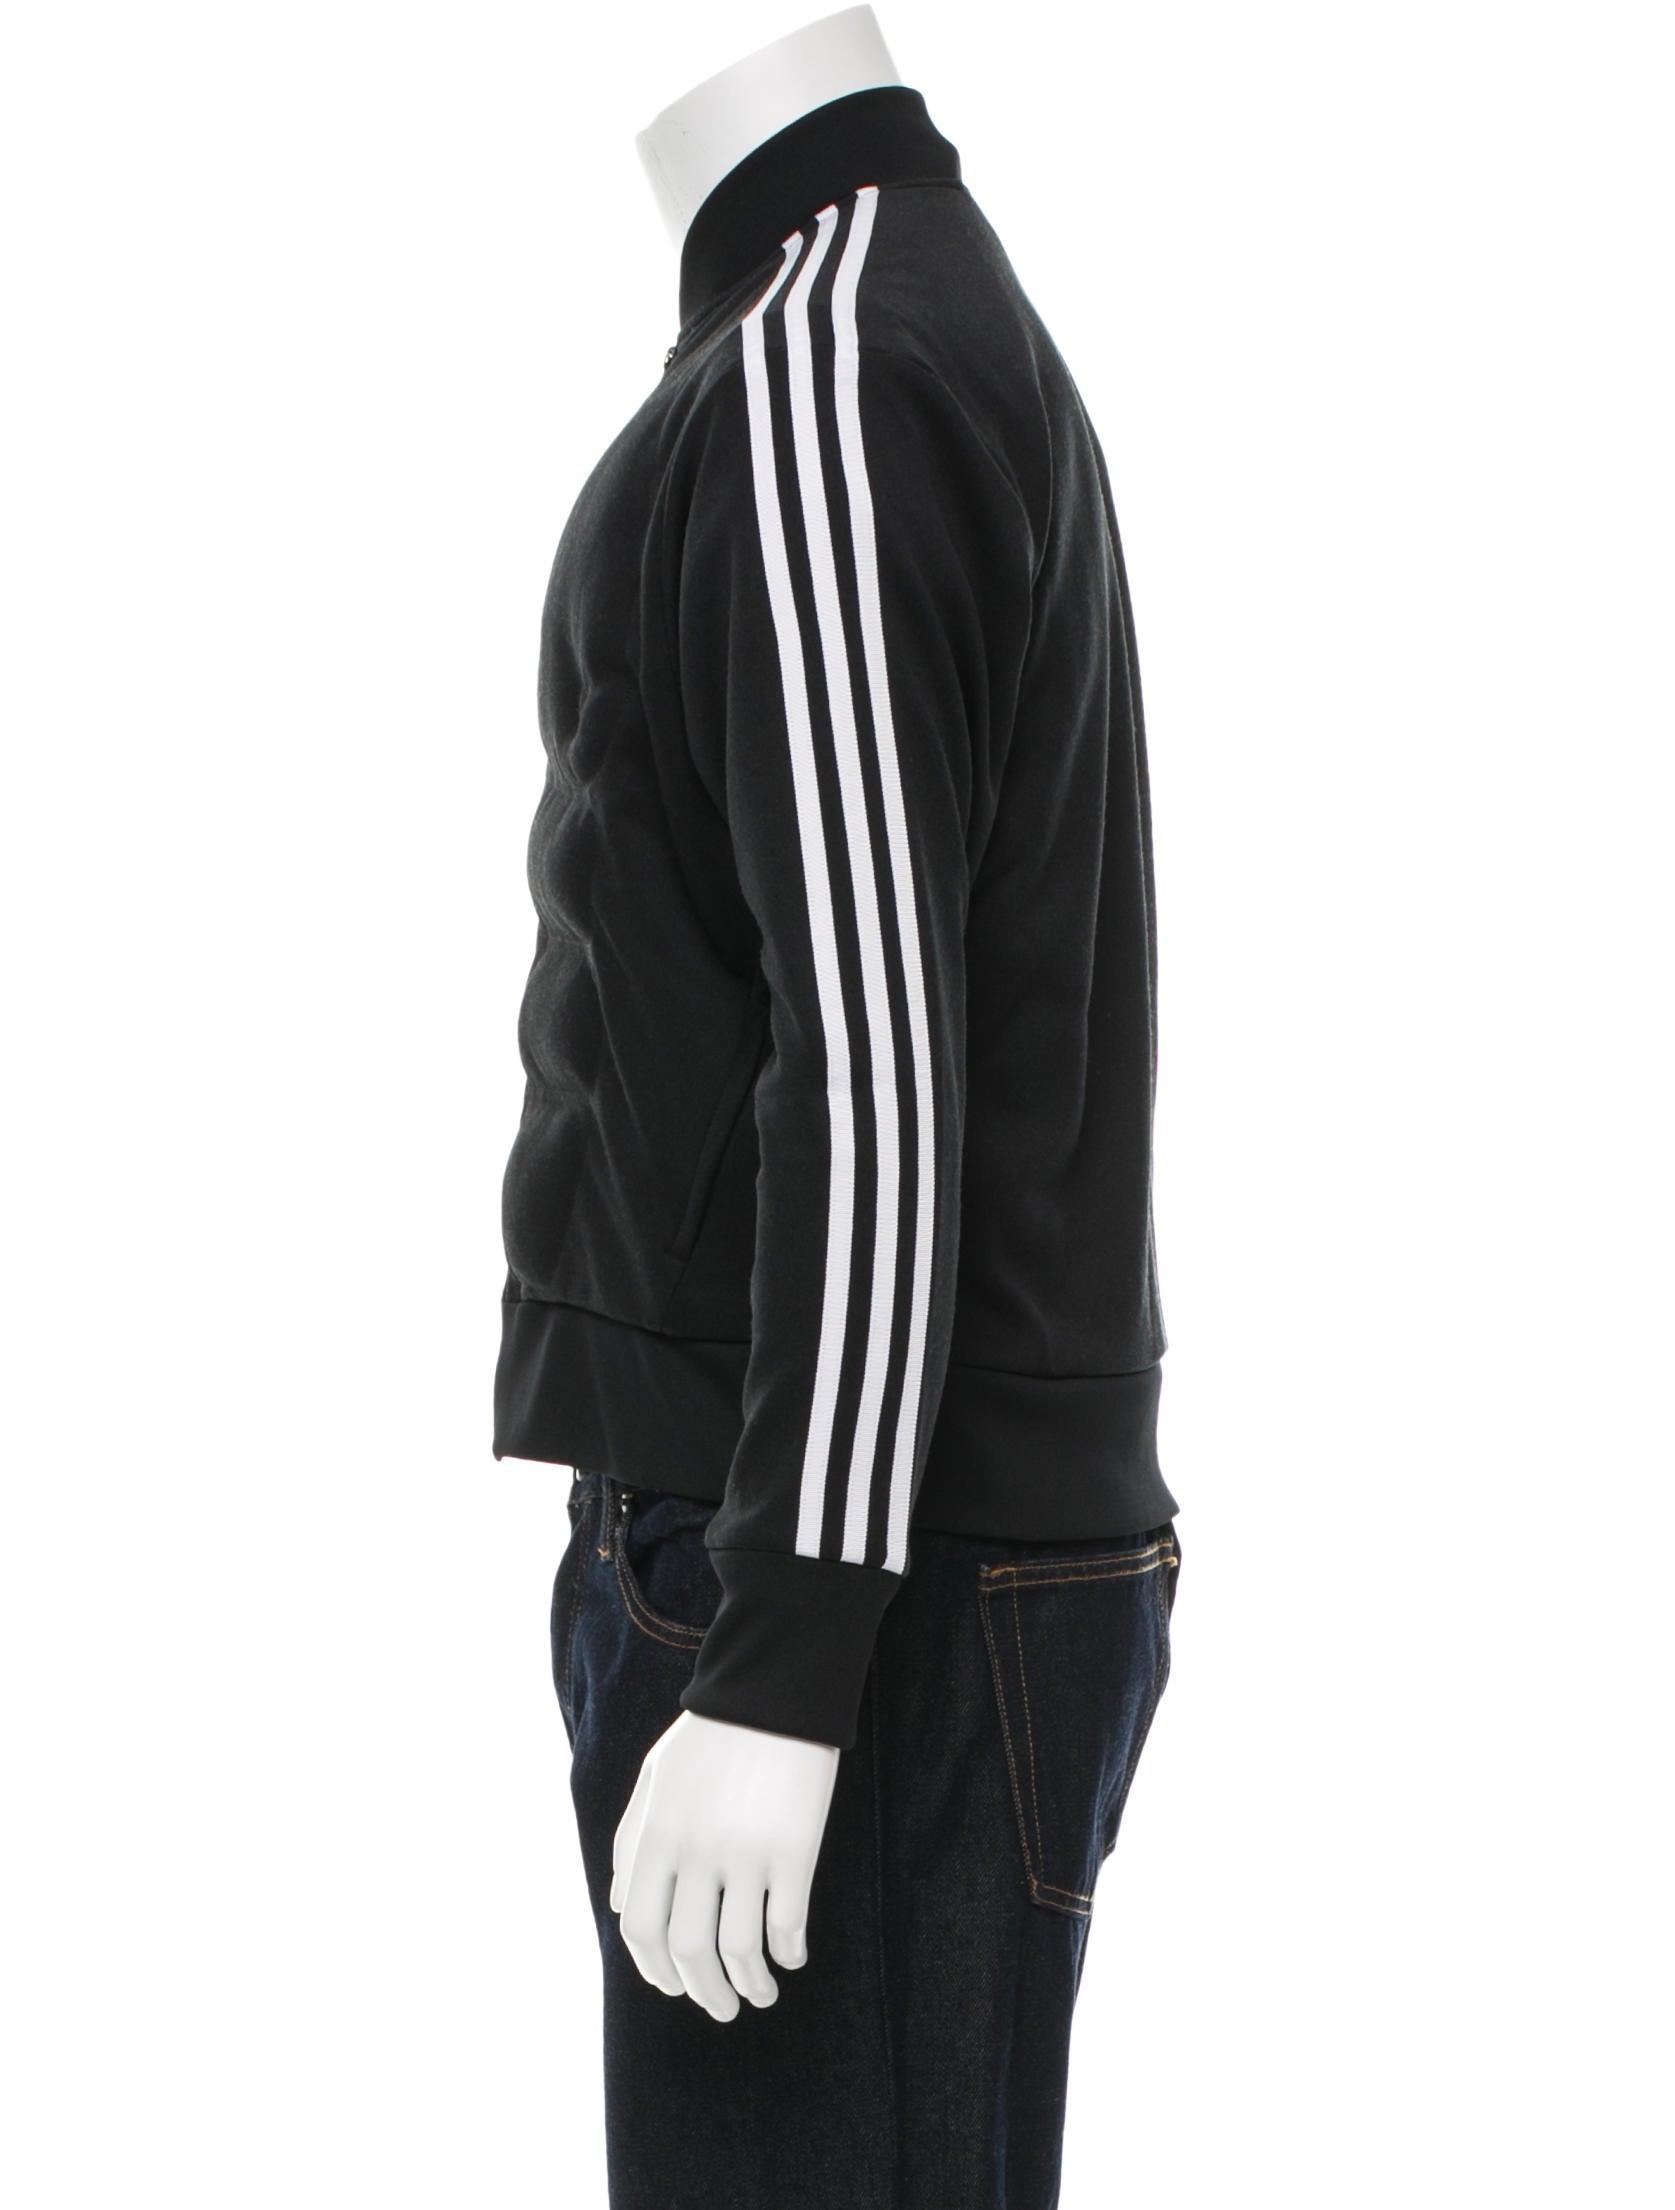 jeremy scott adidas hoodie